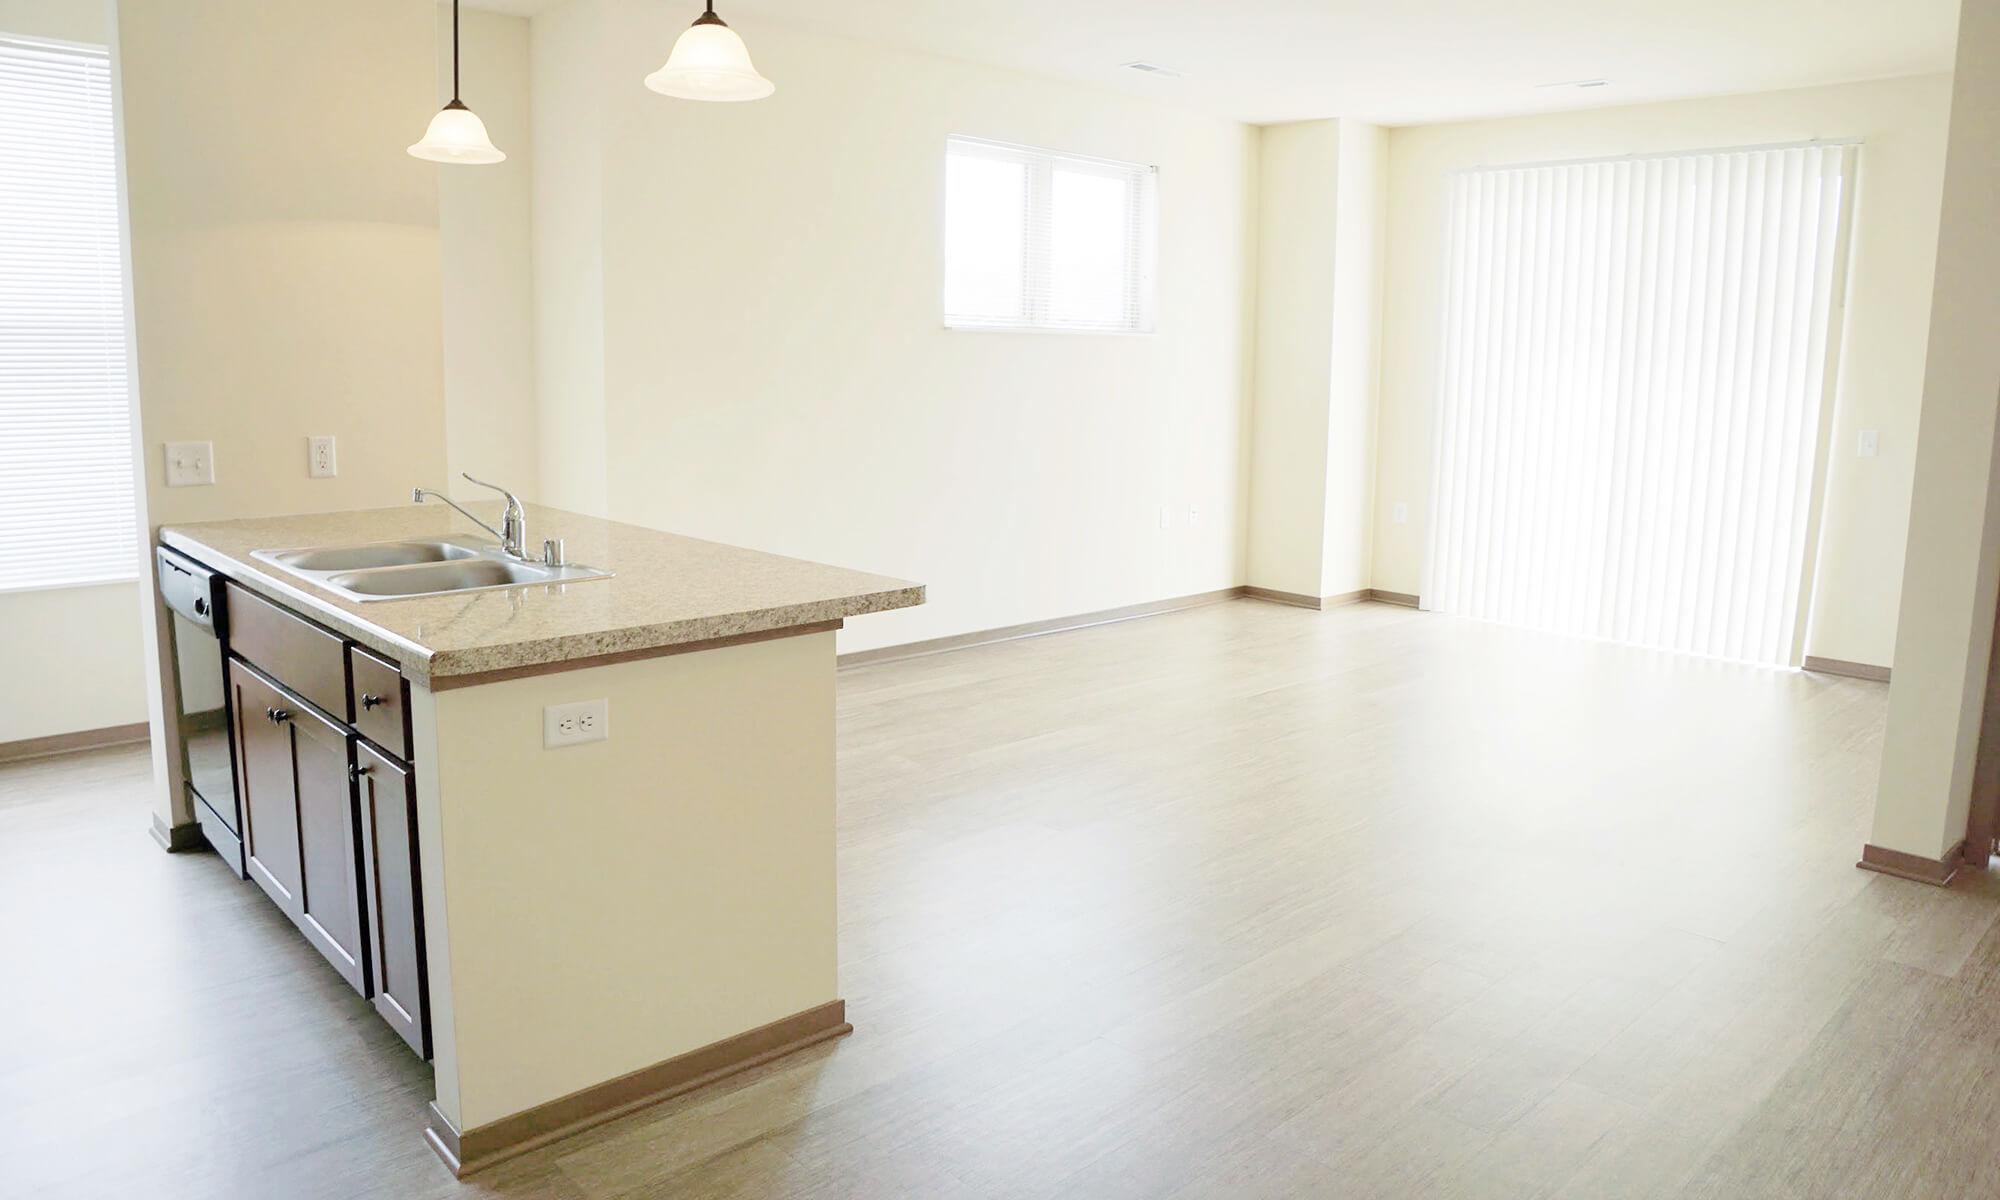 1B 1B Rose Living Kitchen 2